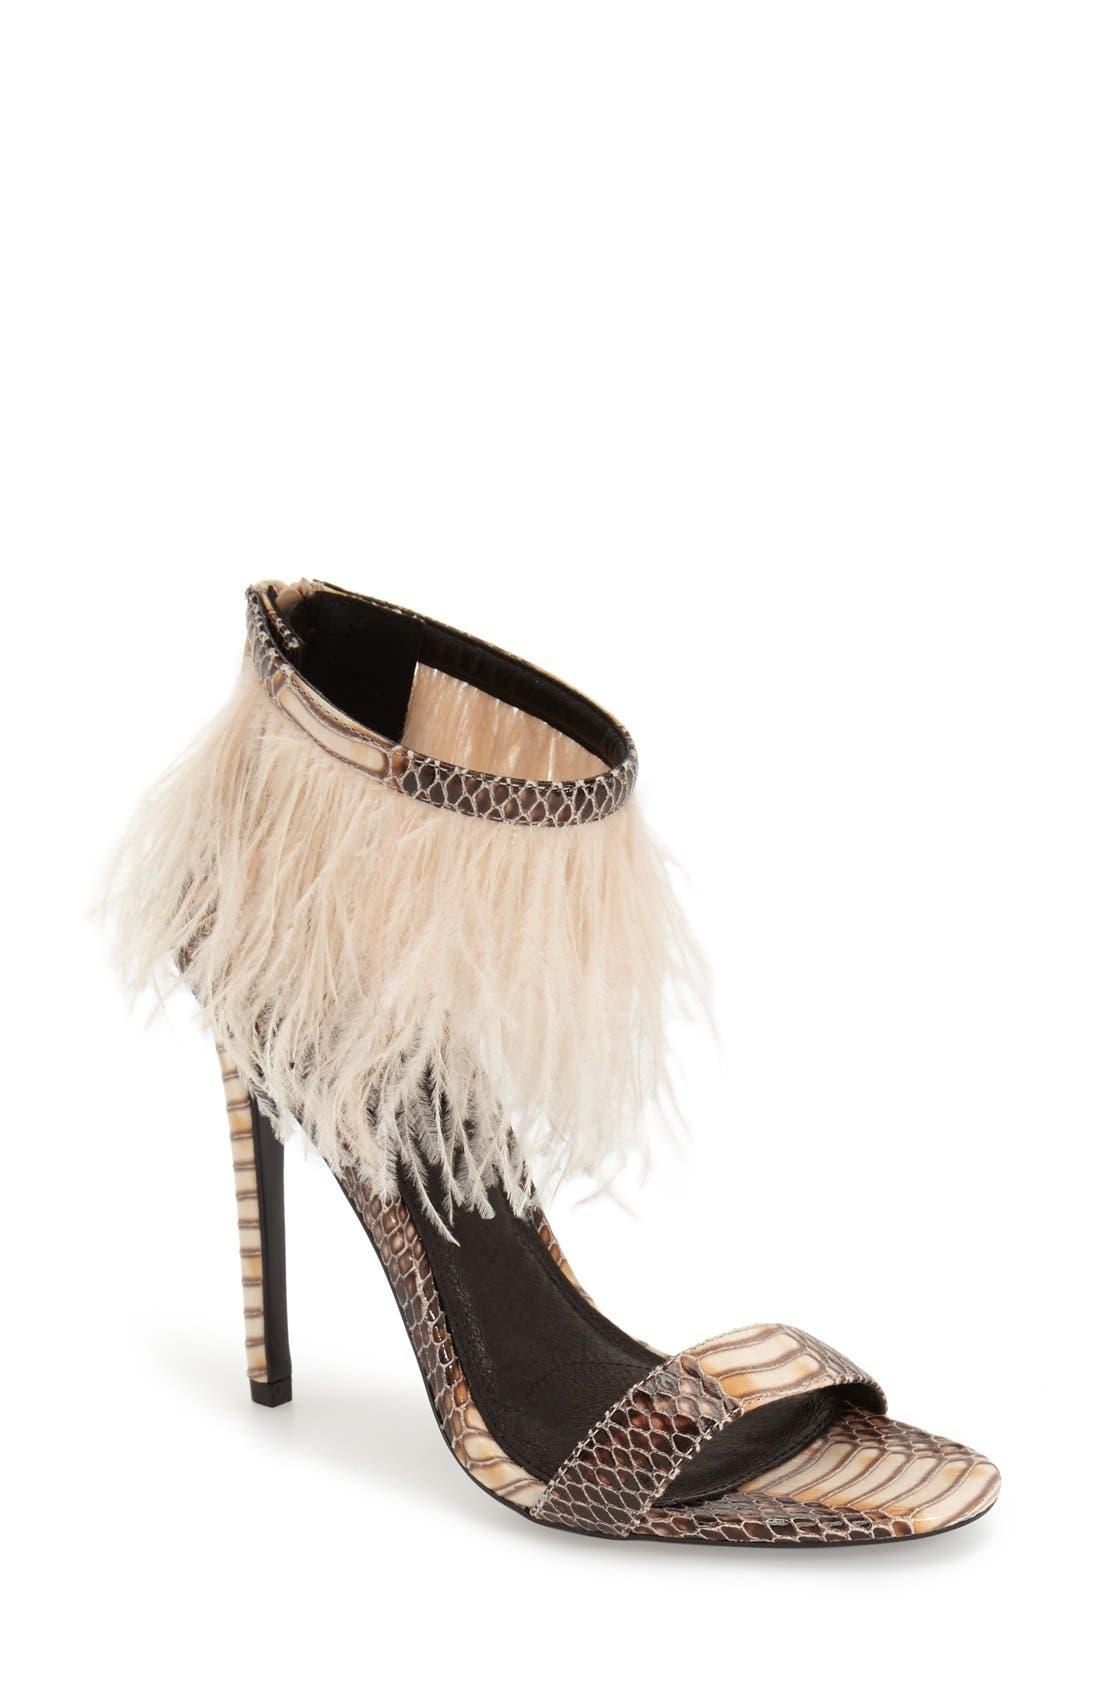 Alternate Image 1 Selected - Topshop 'Ravenous' Feather Sandal (Women)